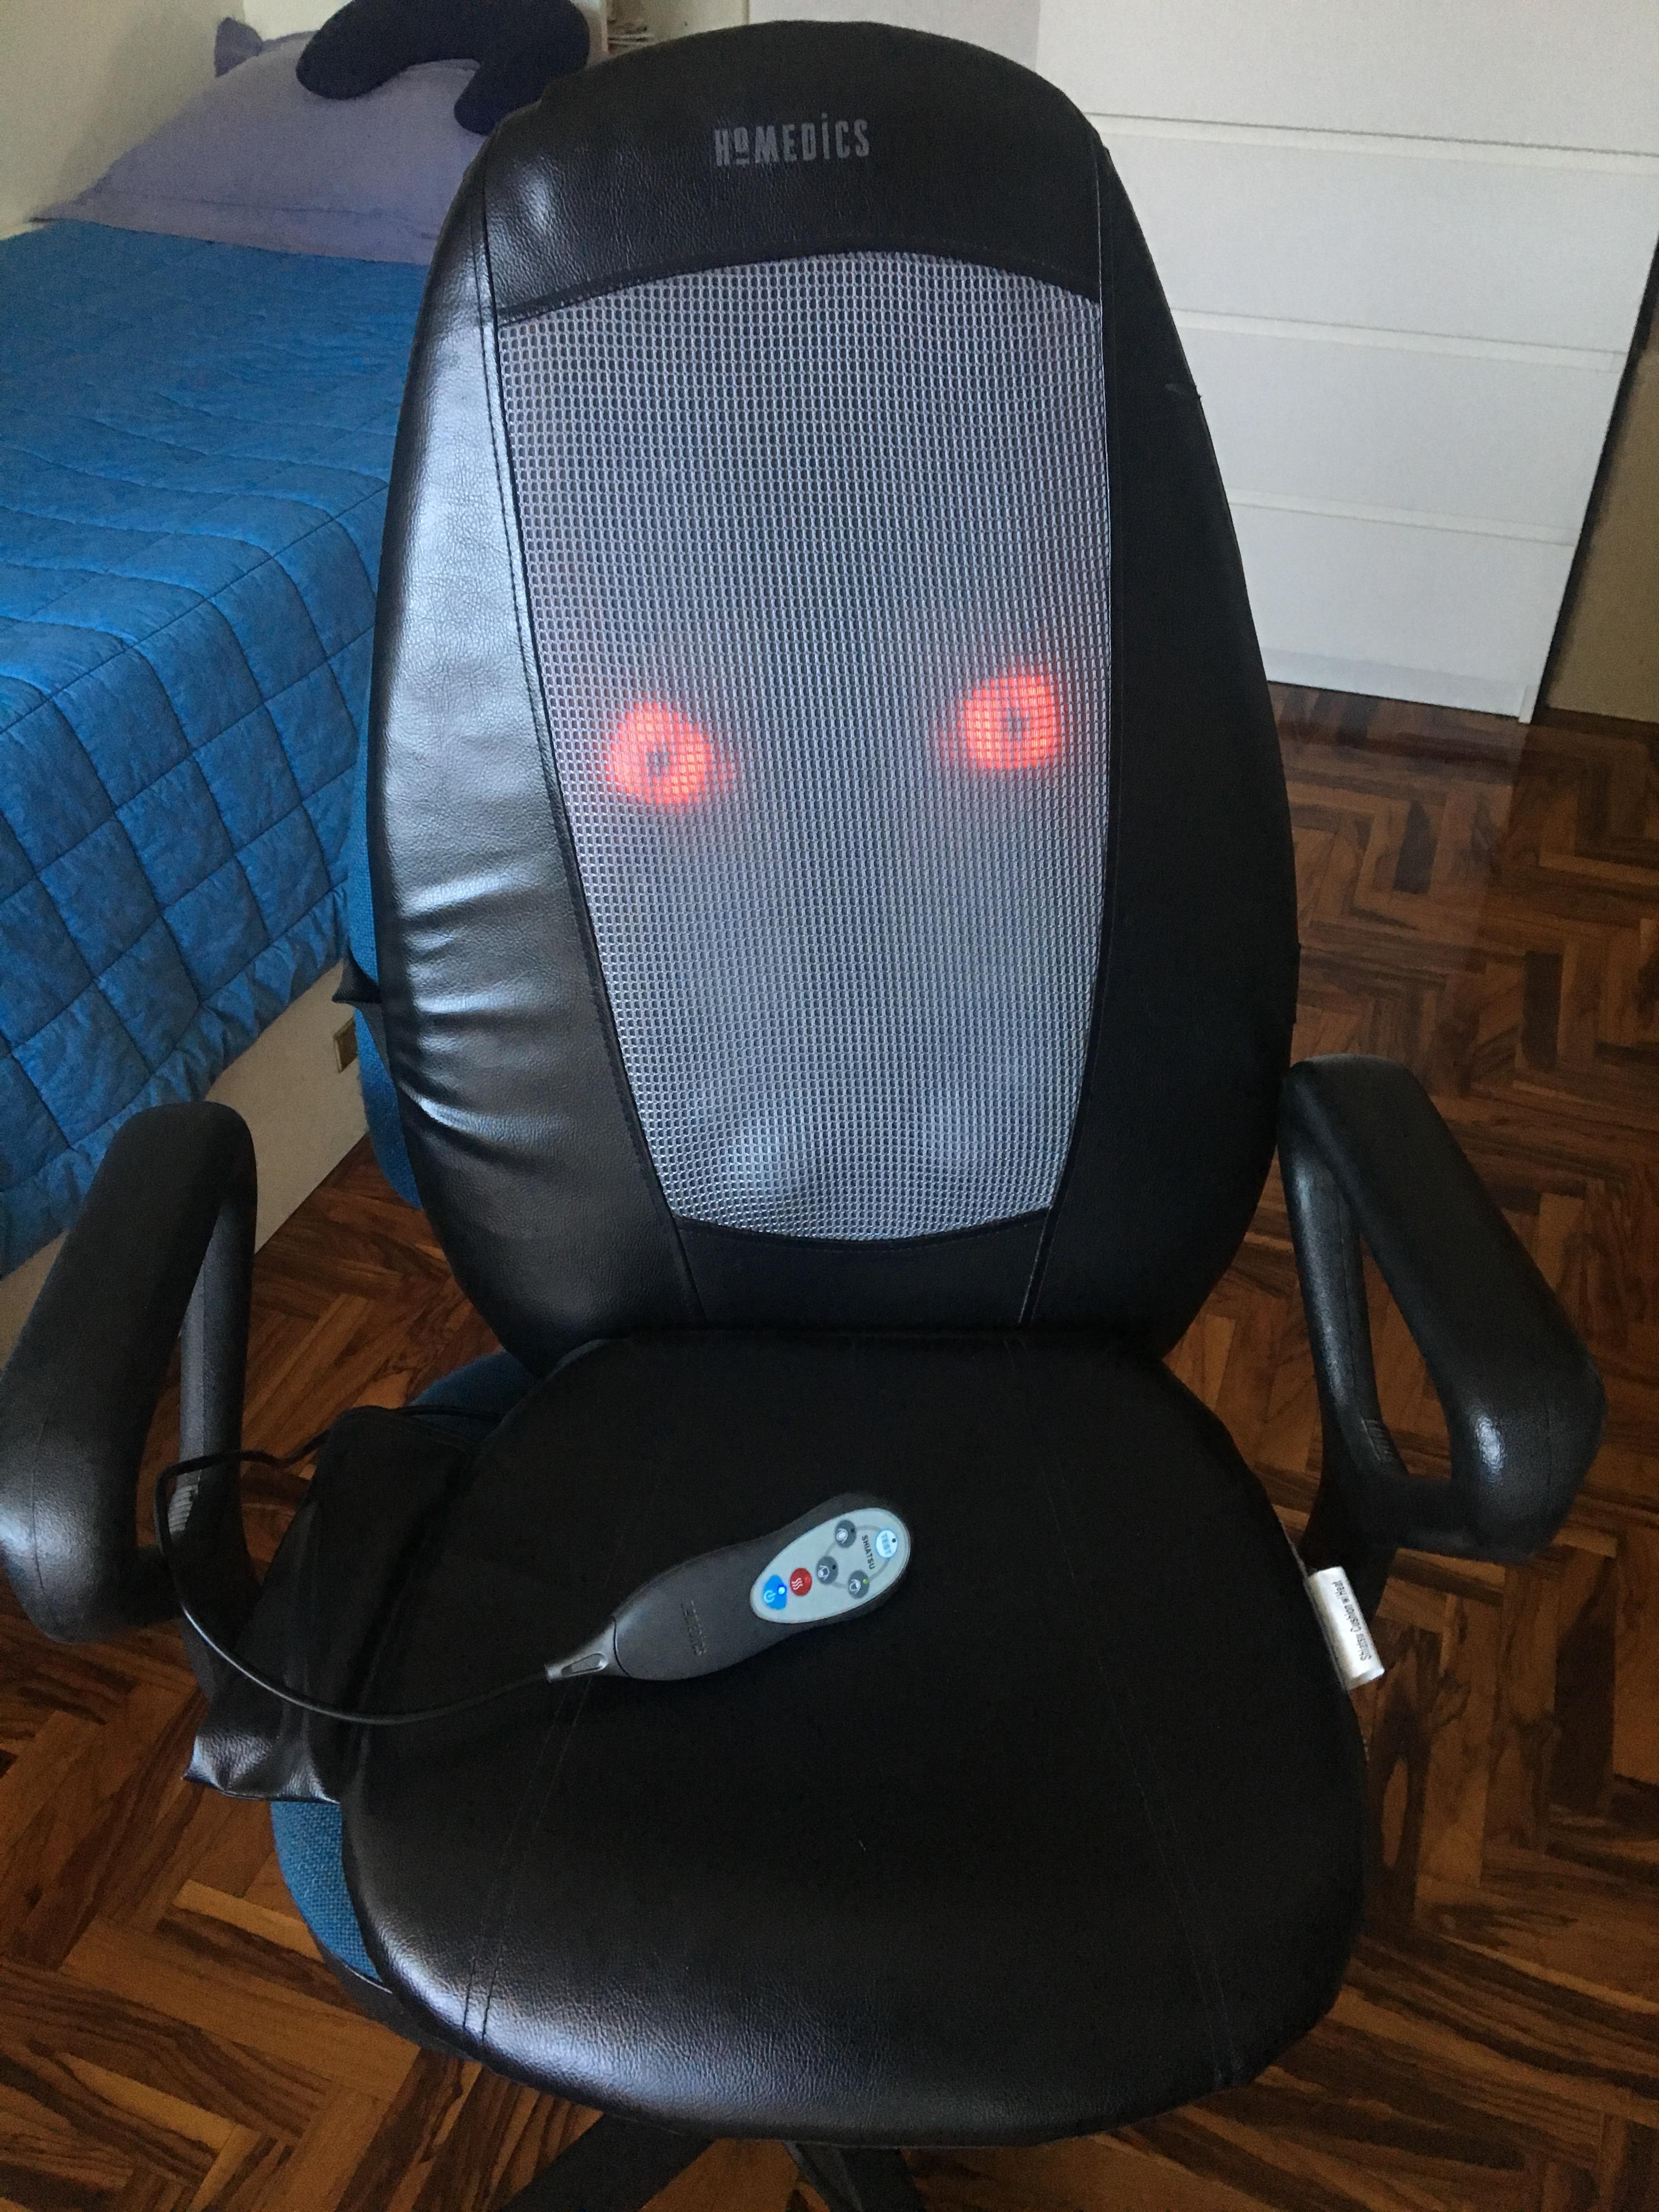 Sedile massaggiante Homedics